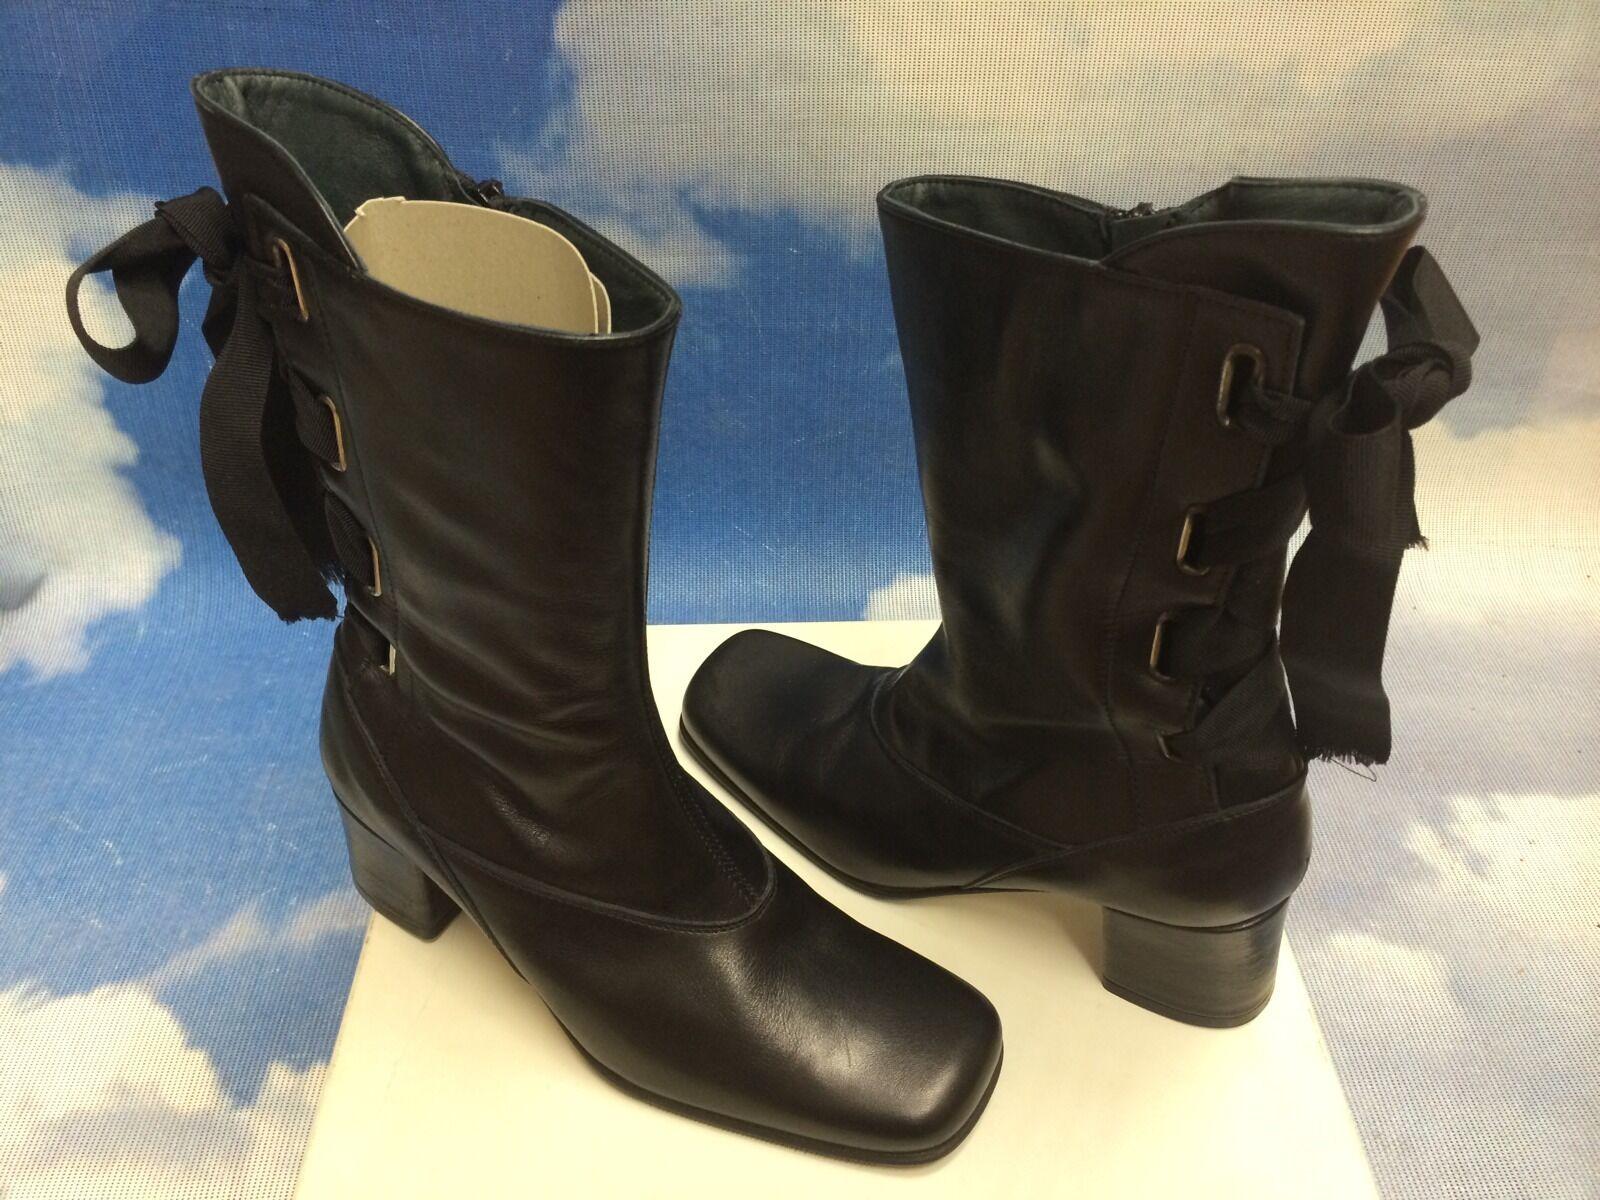 Italian Victorian Style Ribbon Bow Leather Zipper Boot Euro Suze 37 / US Women 7